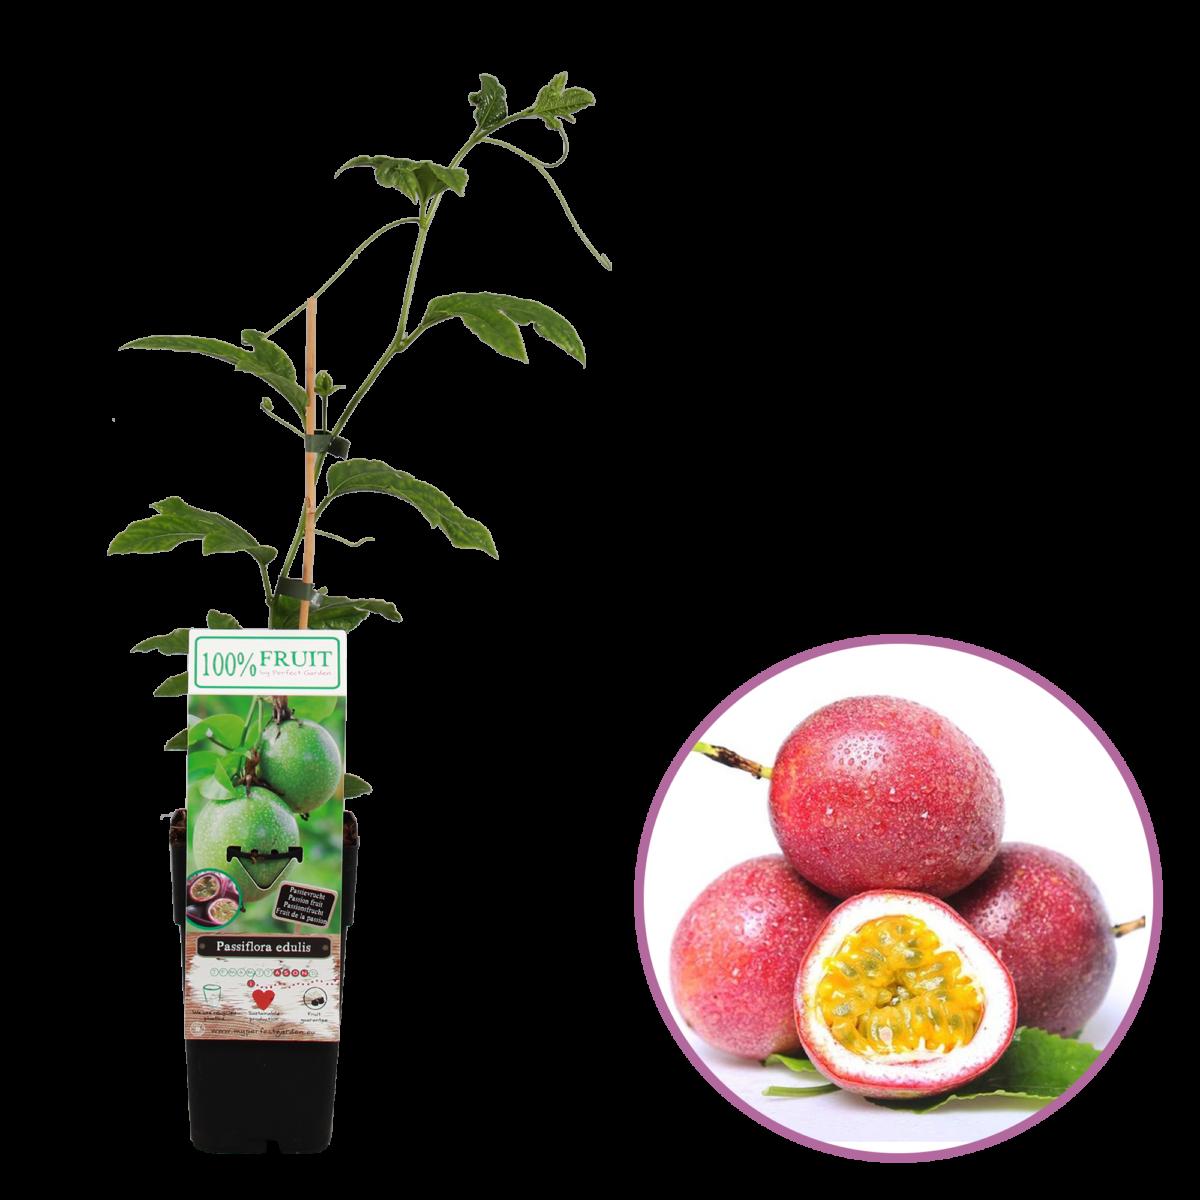 boskoopsefruitbomen | Passiflora edulis | Passievrucht